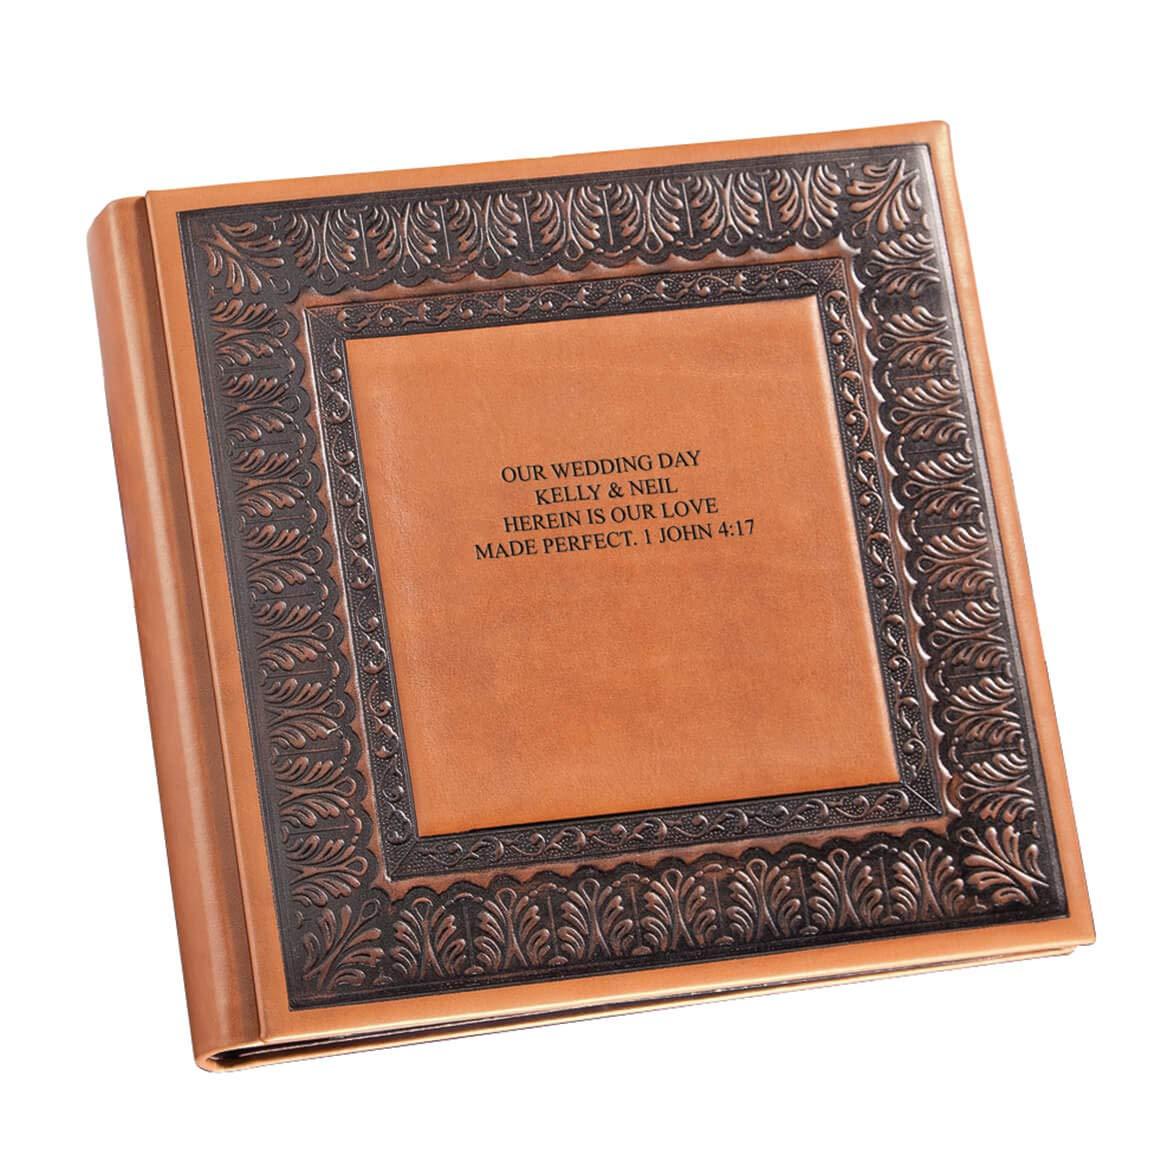 Exposures Personalized Bellini Leather Album, Customize 3 Lines